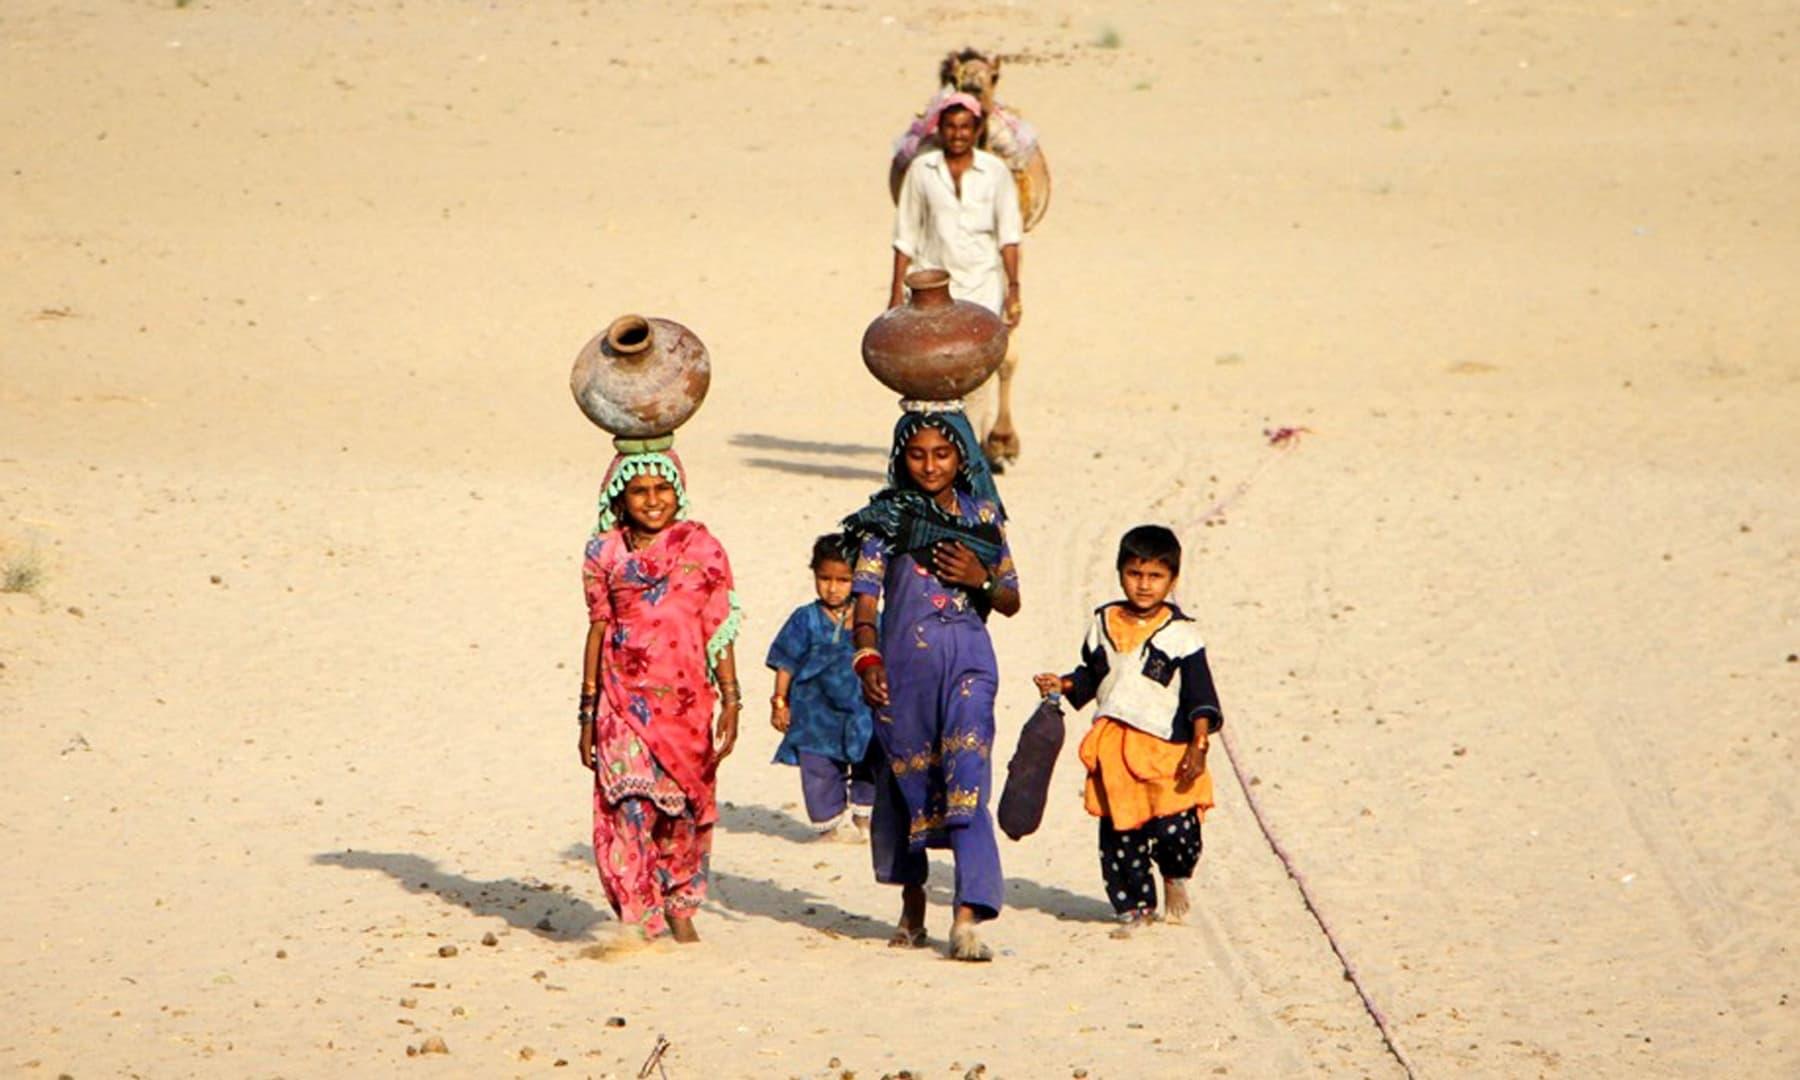 Women fetching water in Chhachhro taluka, Mithi, Sindh. — Photo by Umair Ali